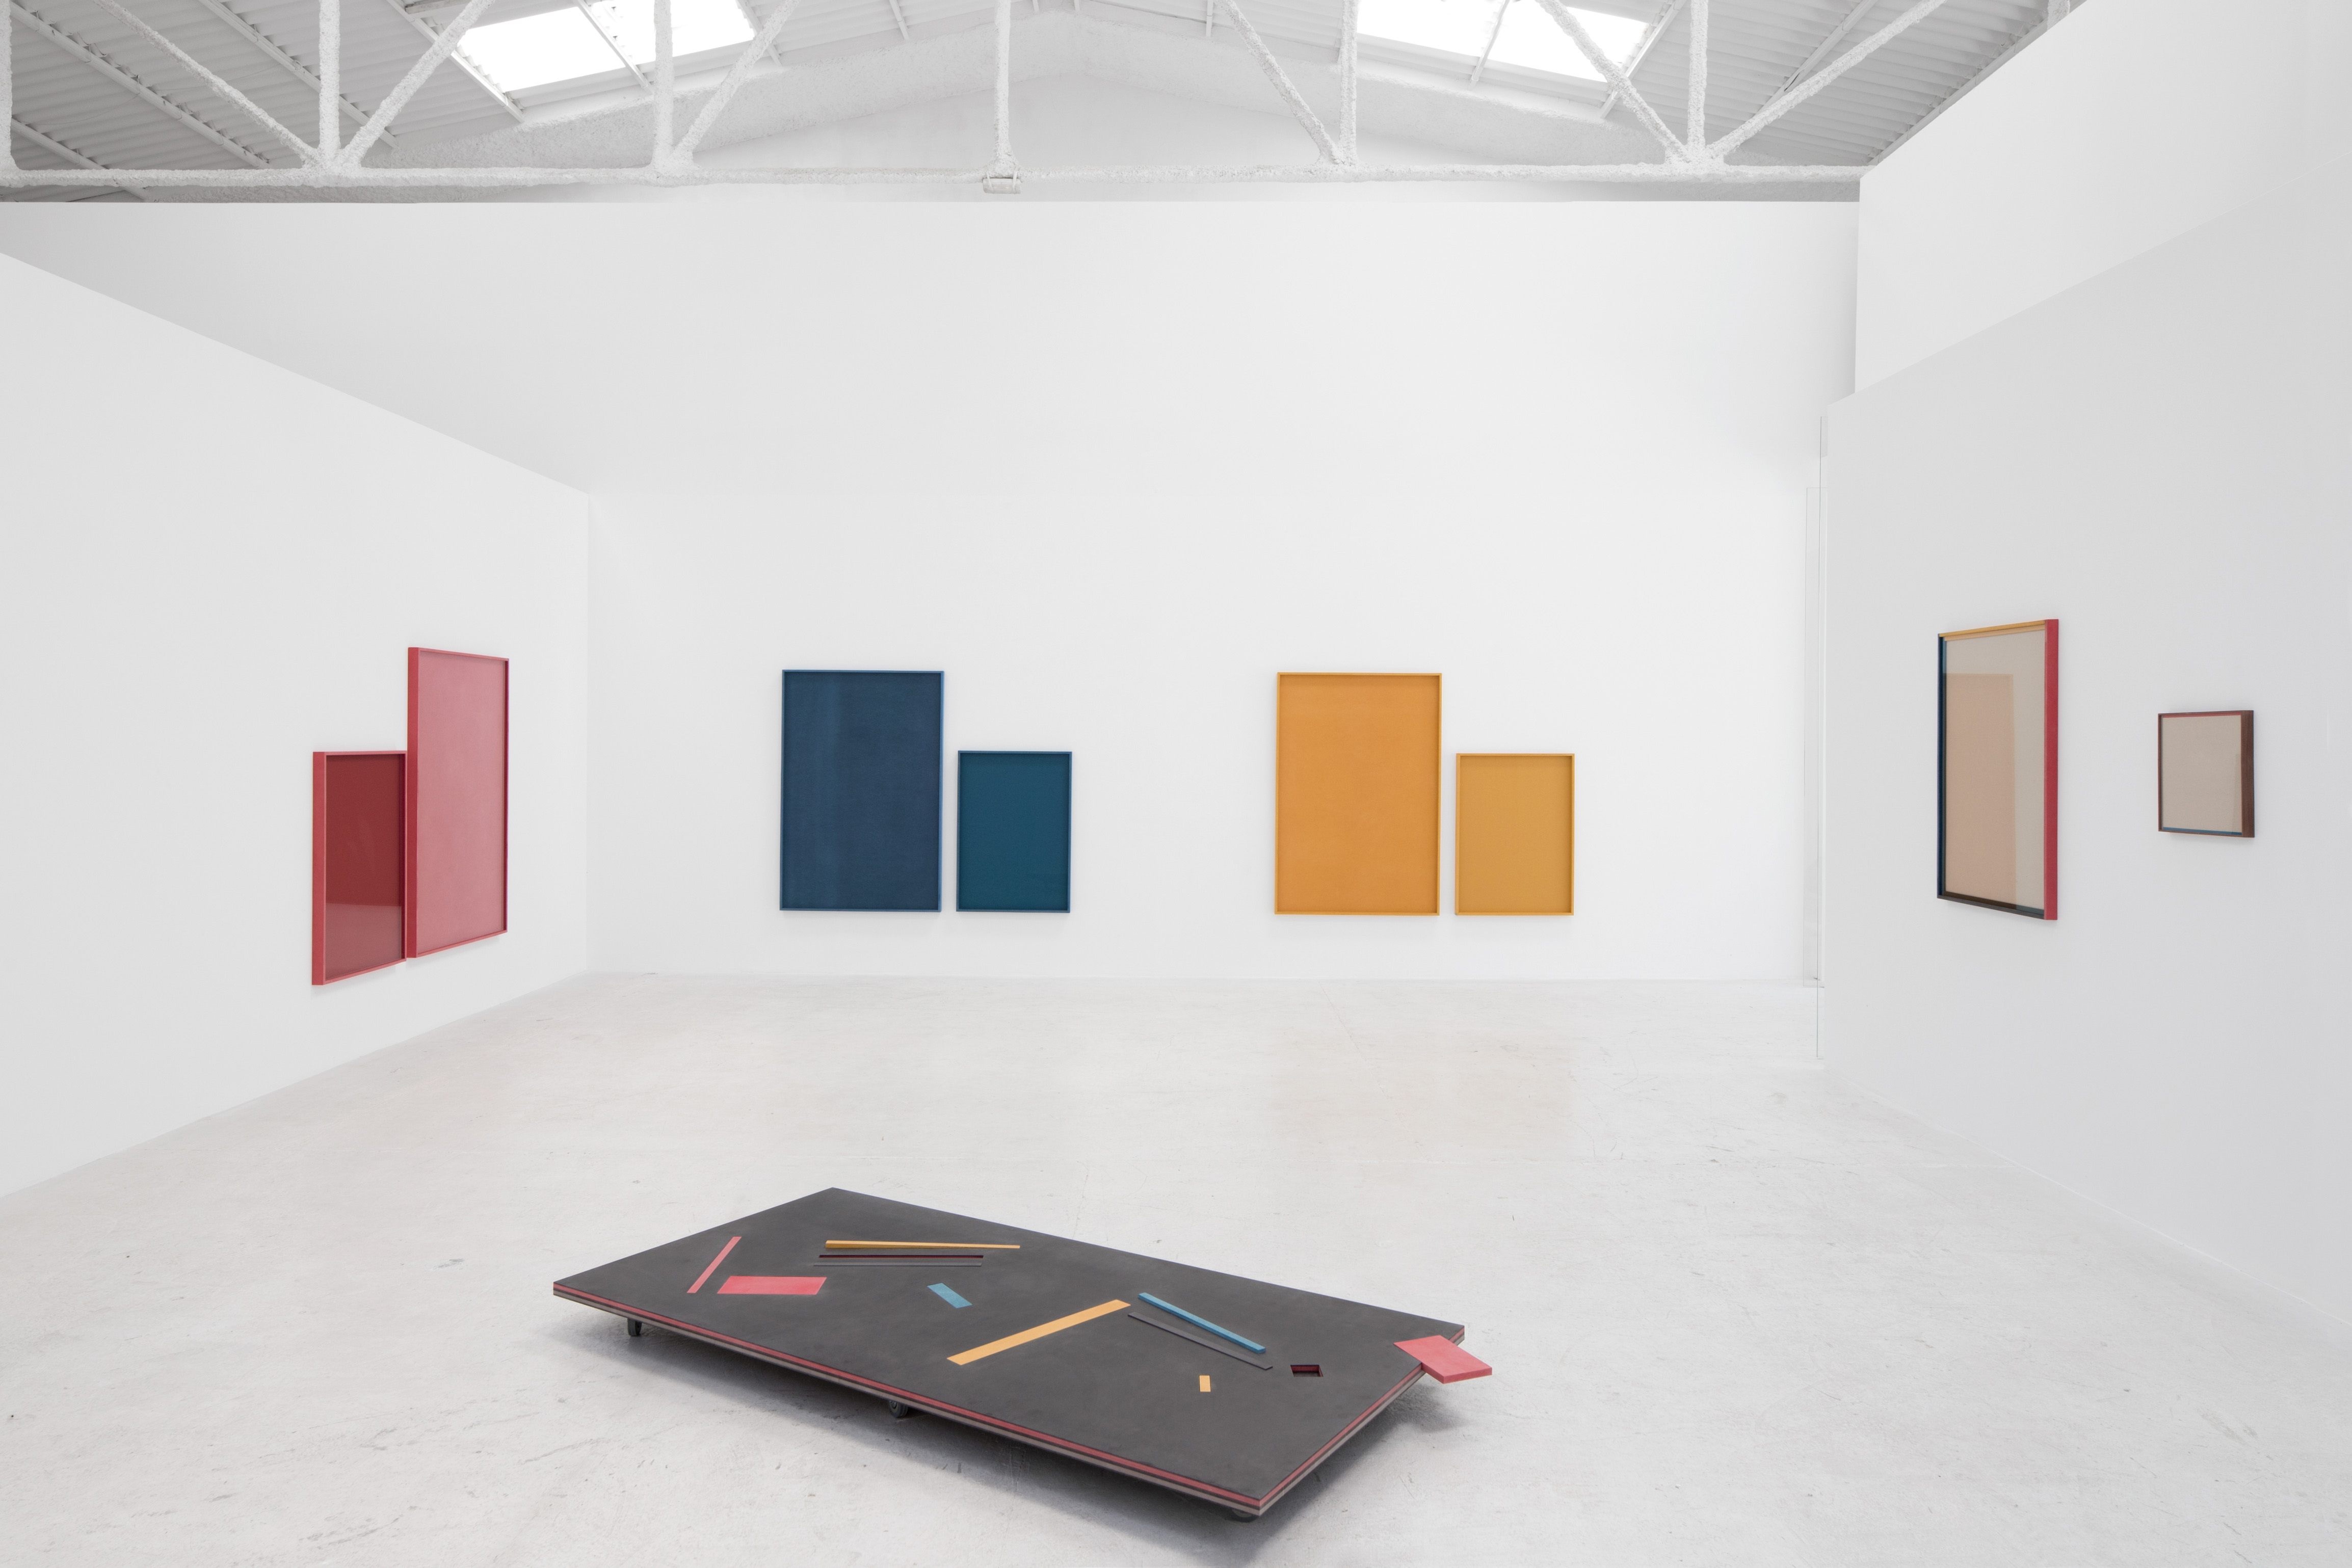 Installation view: Irma Álvarez-Laviada: TODO SE PARECE A ALGO , L21, 14 May – 23 June. Courtesy: L21 Gallery